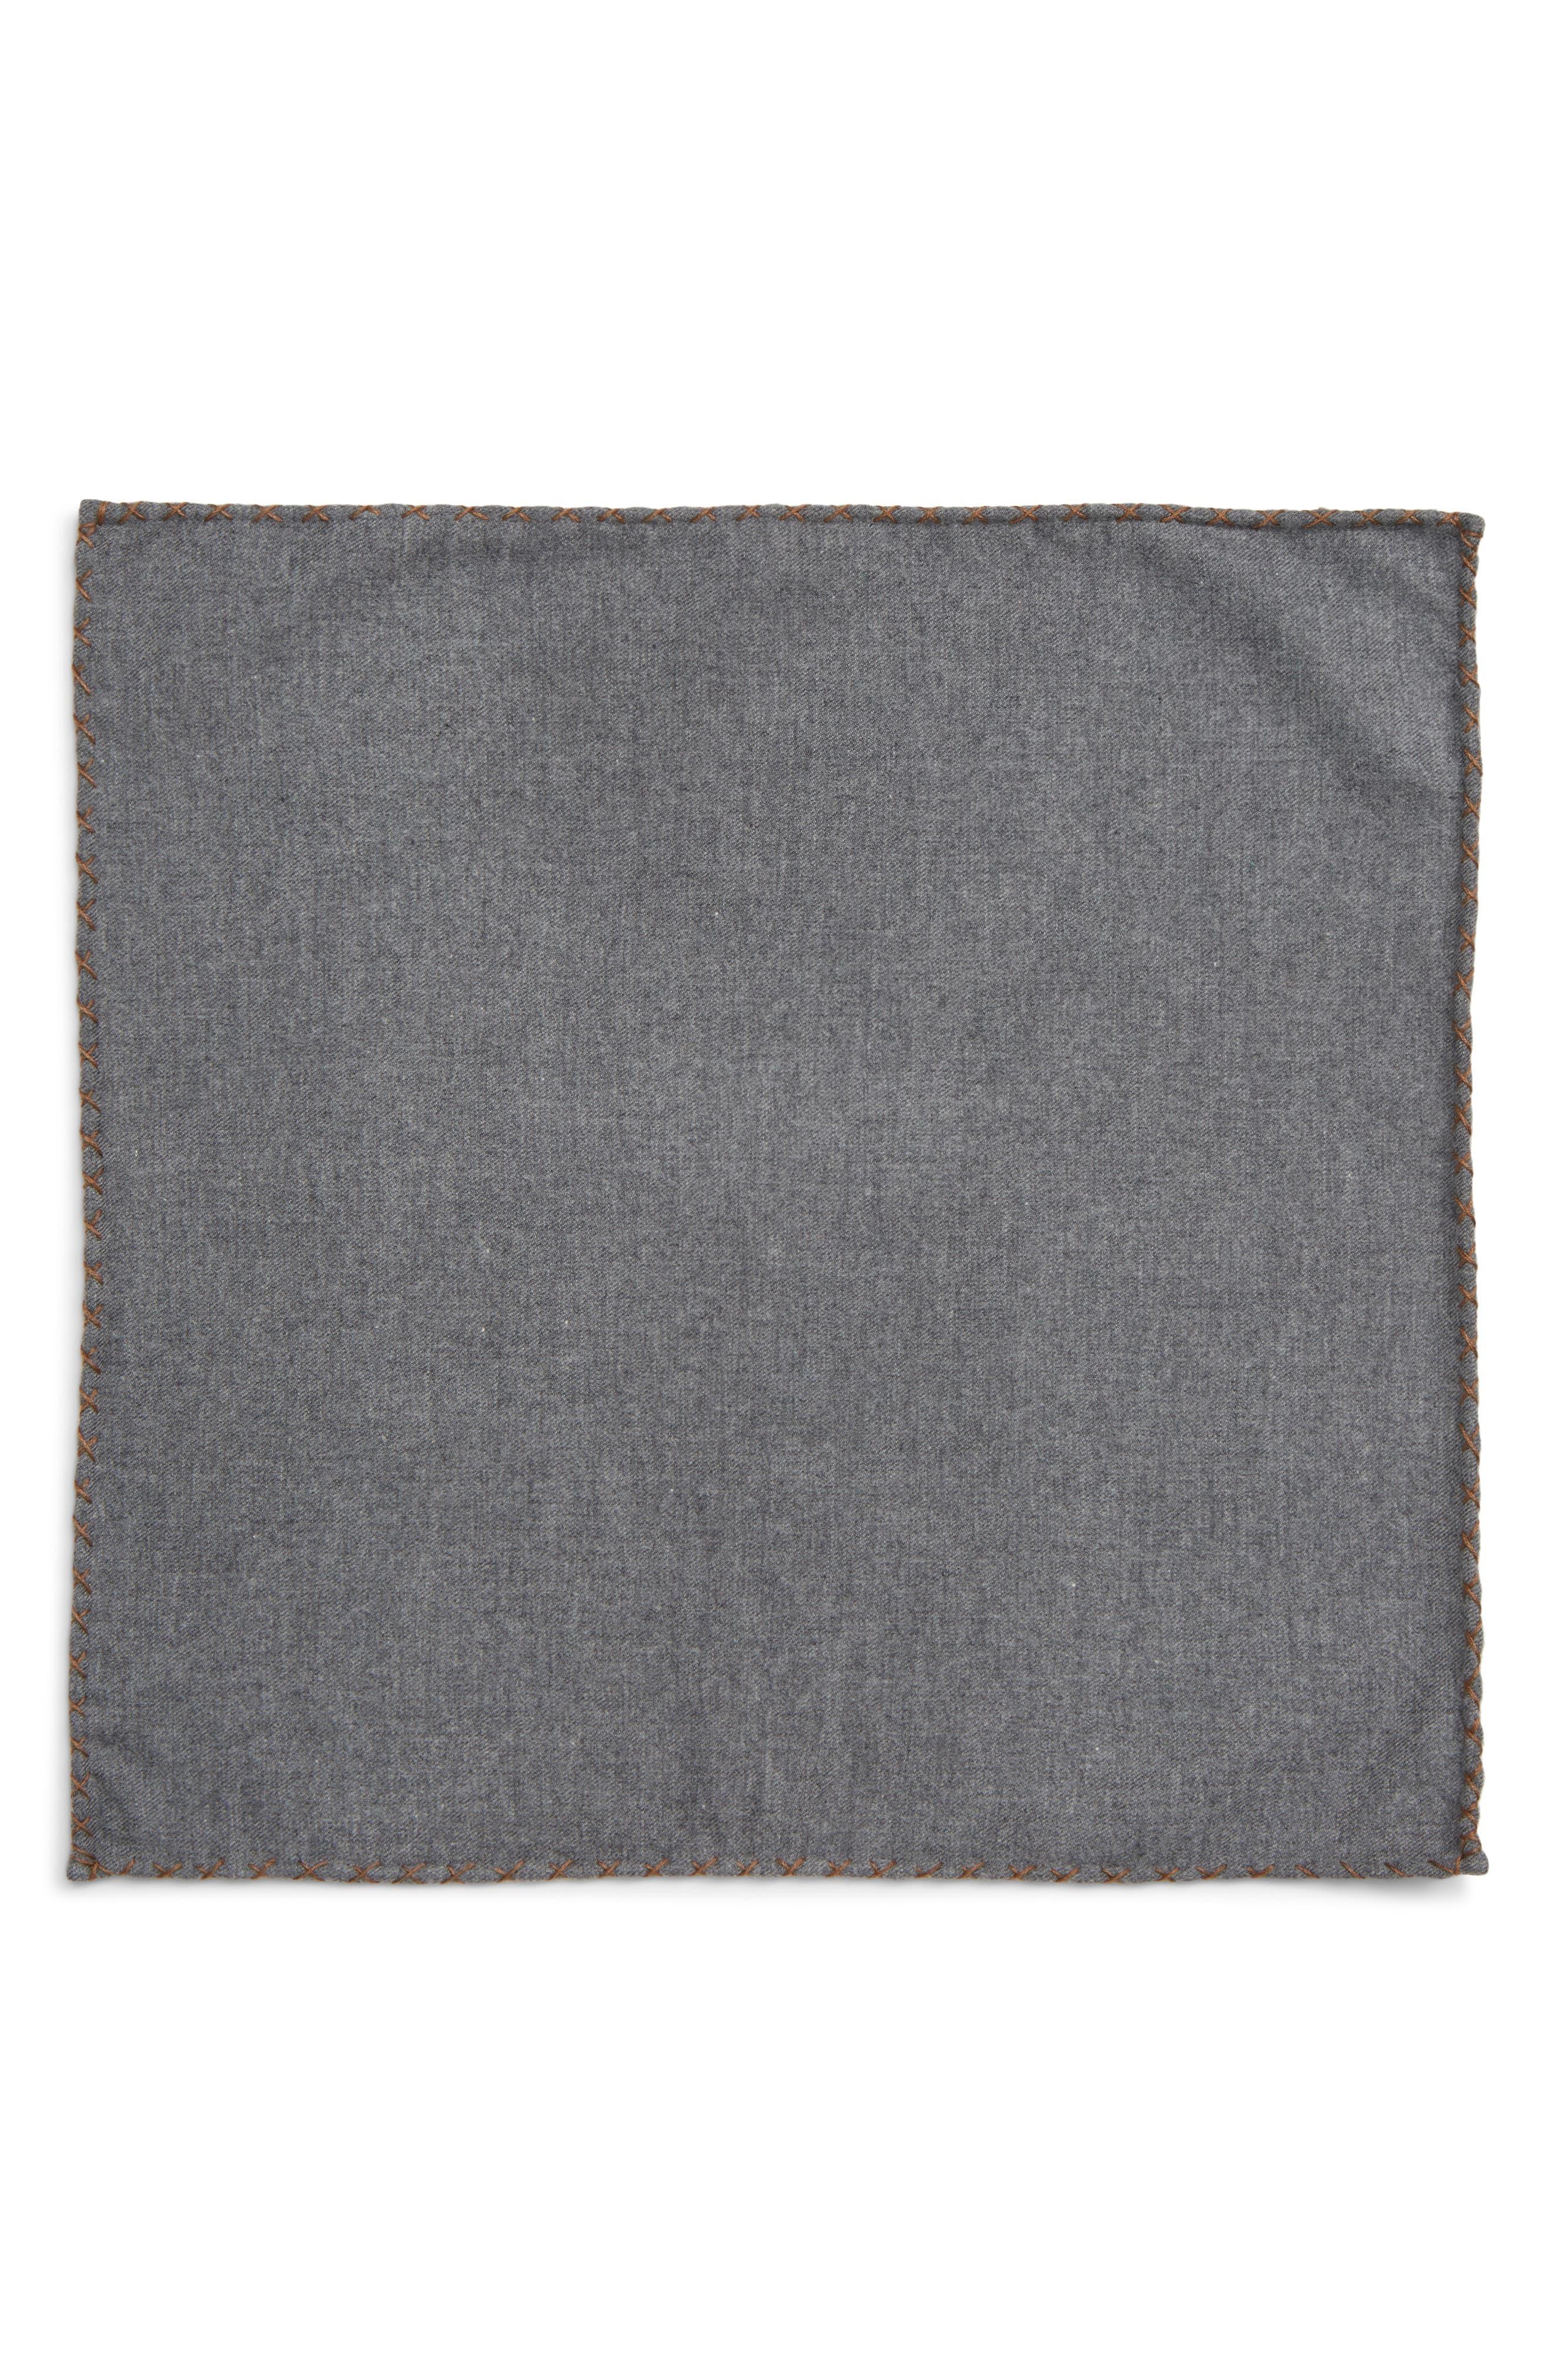 Solid Cotton Pocket Square,                             Alternate thumbnail 2, color,                             GREY/ CAMEL